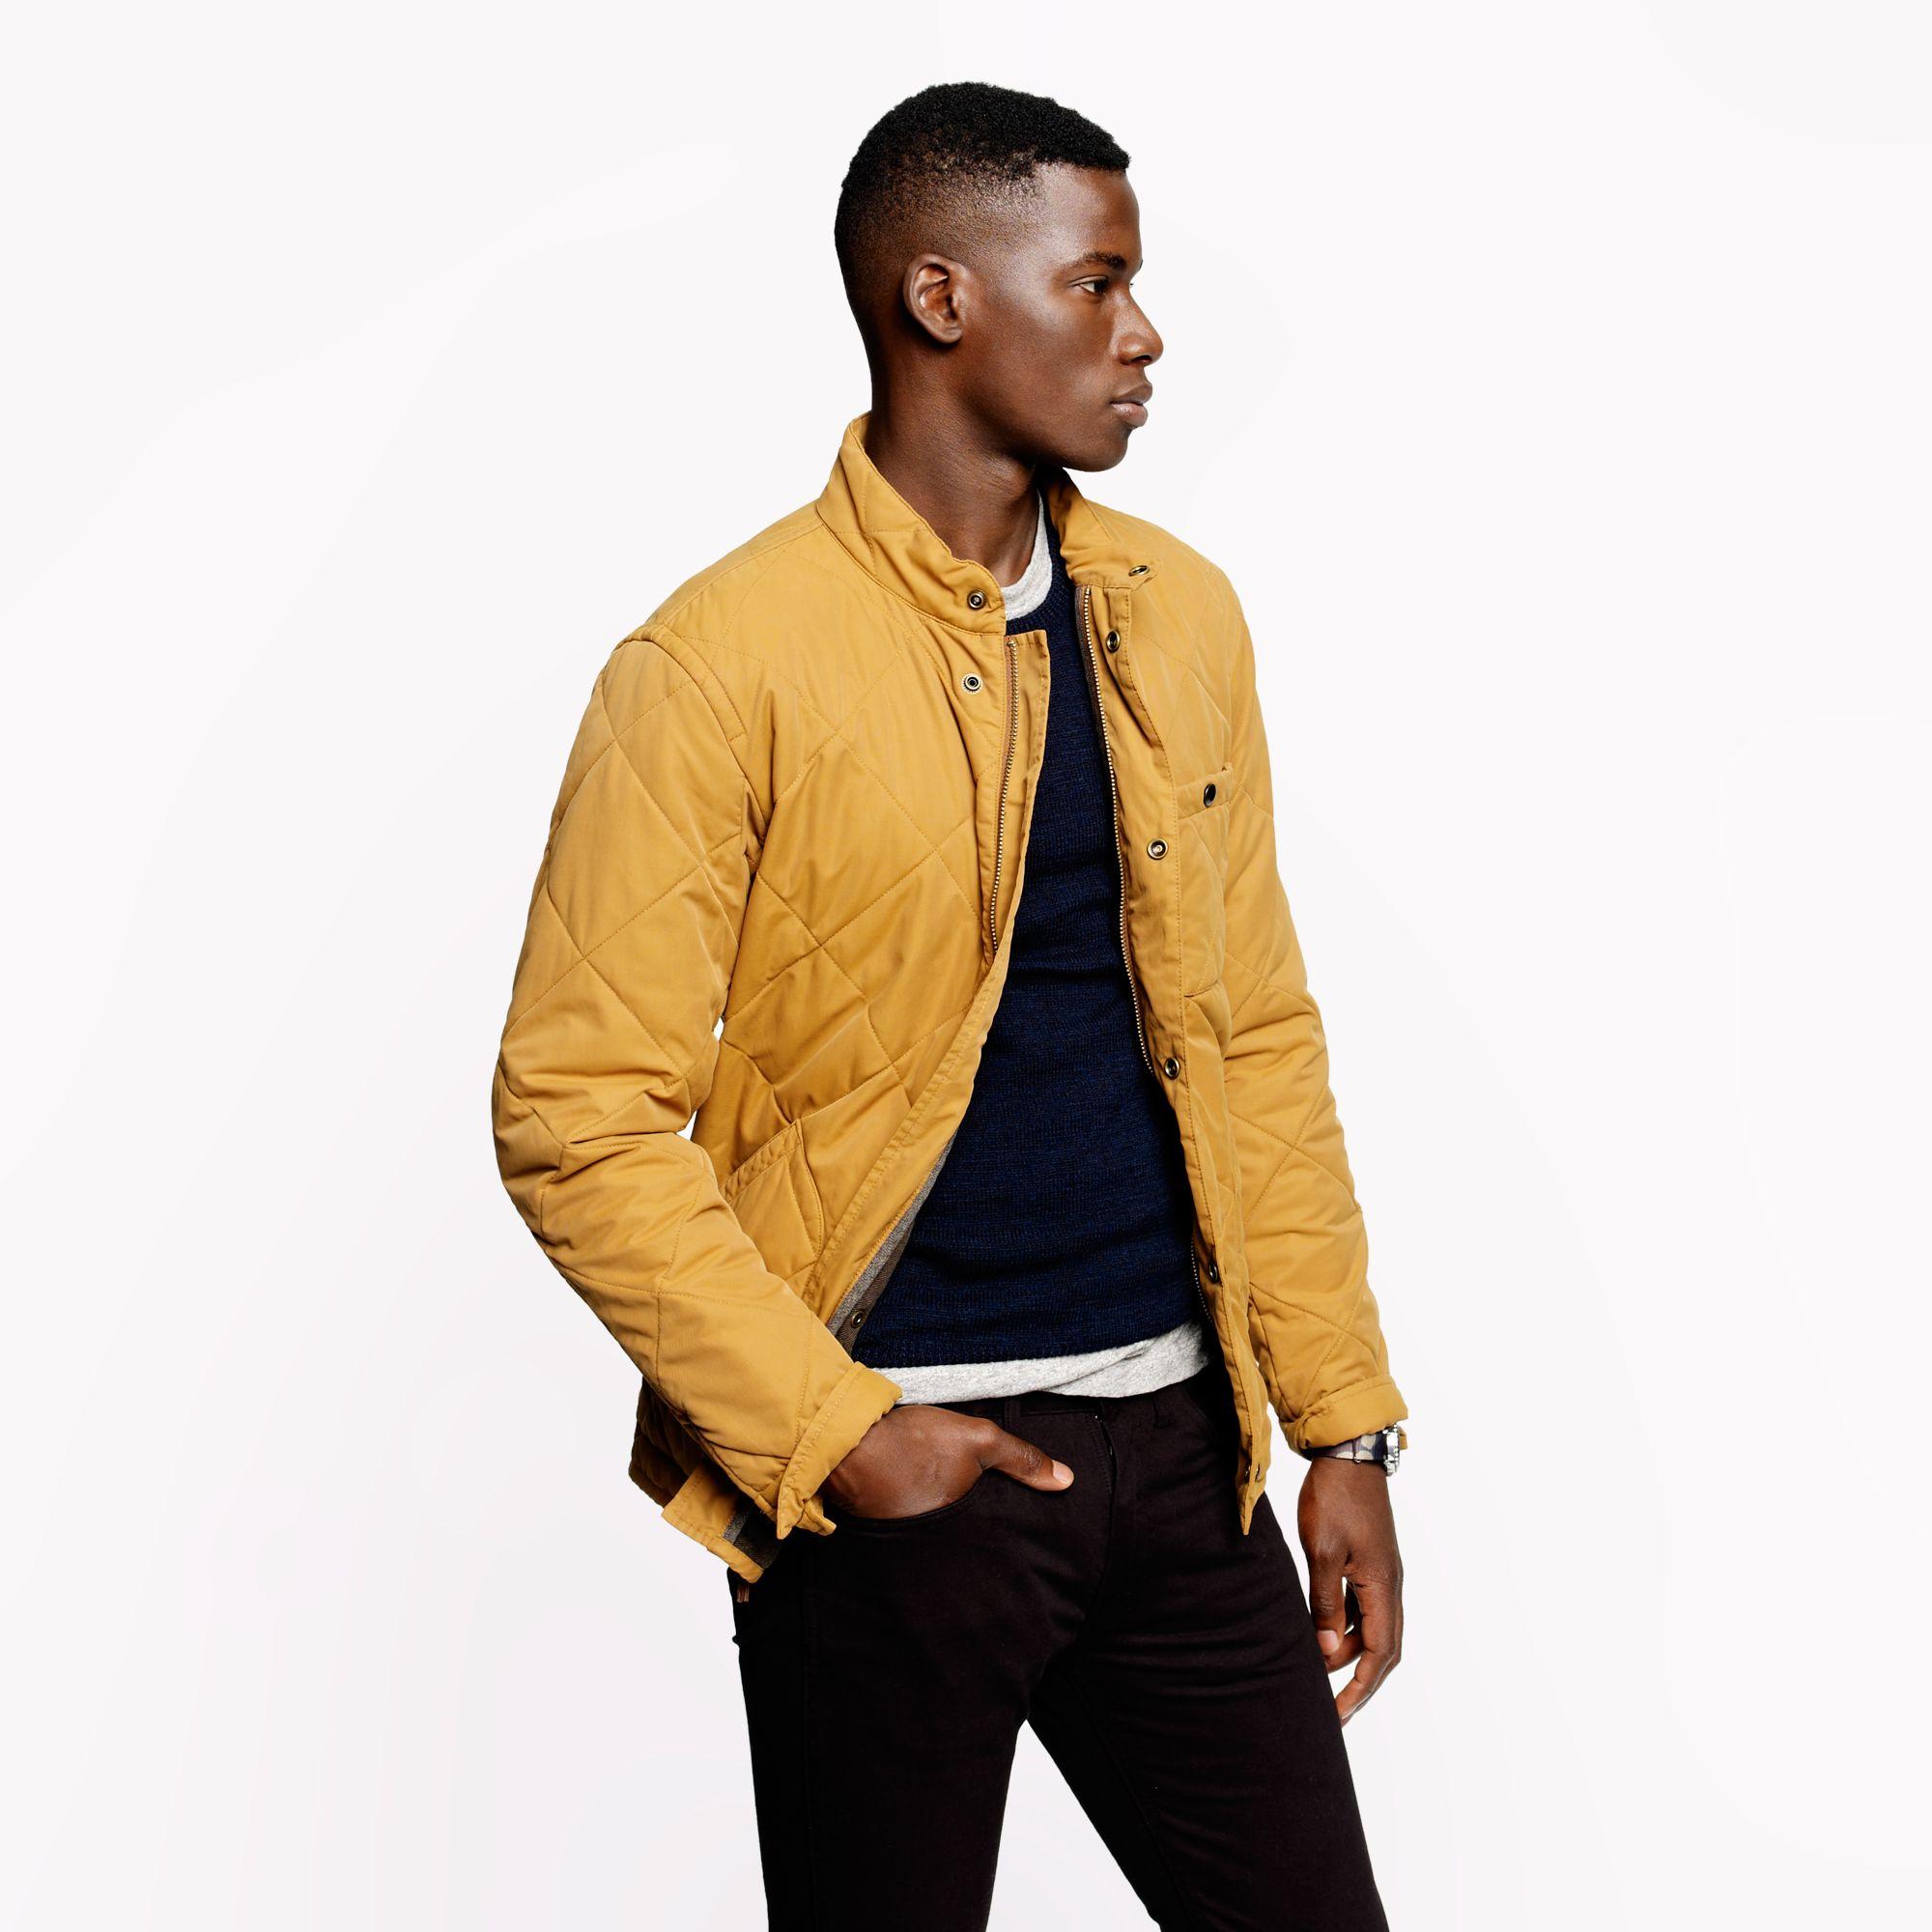 J Crew Broadmoor Quilted Jacket In Yellow For Men Lyst